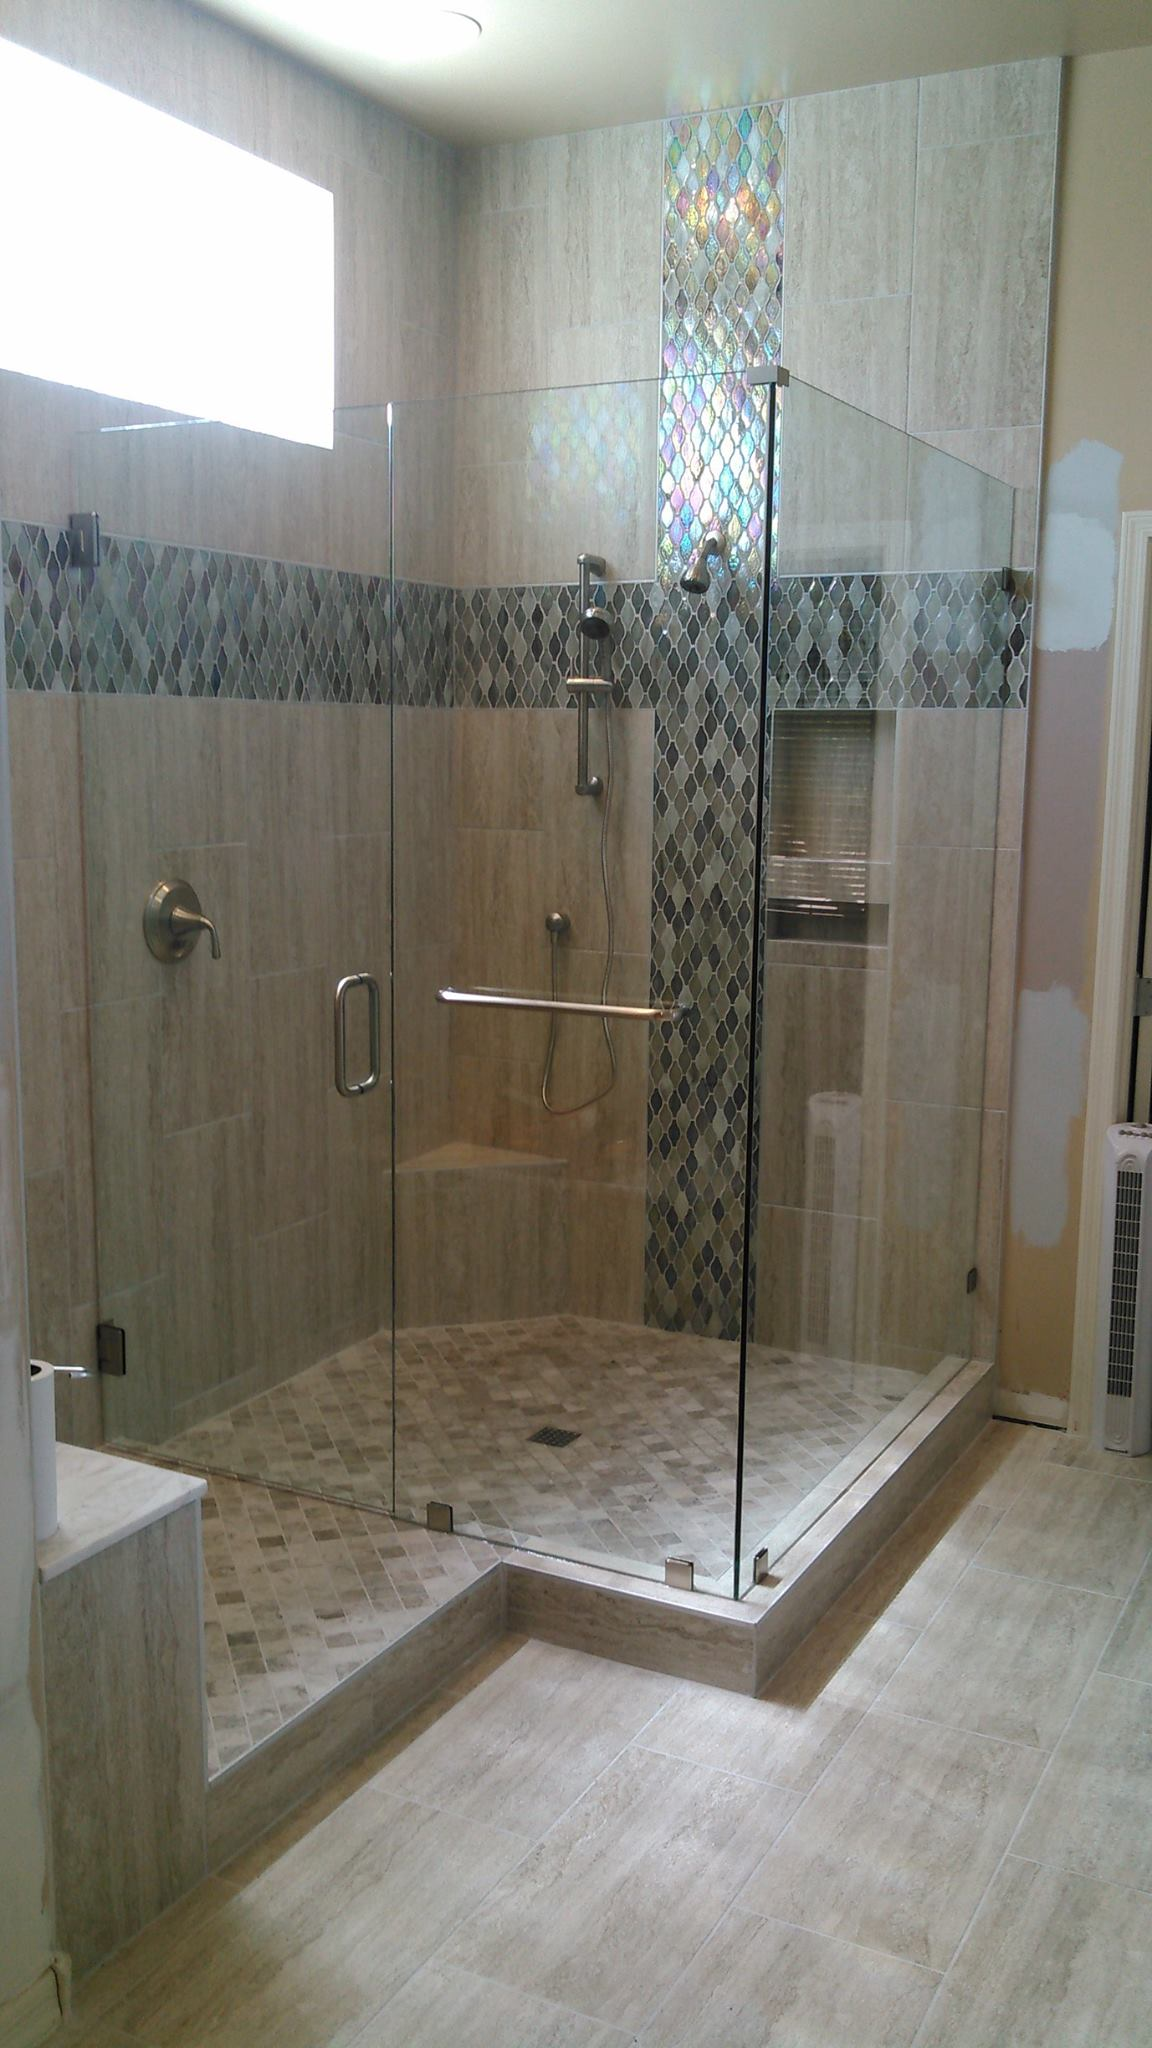 Shower Doors Enclosures Repairs True View Windows Glass